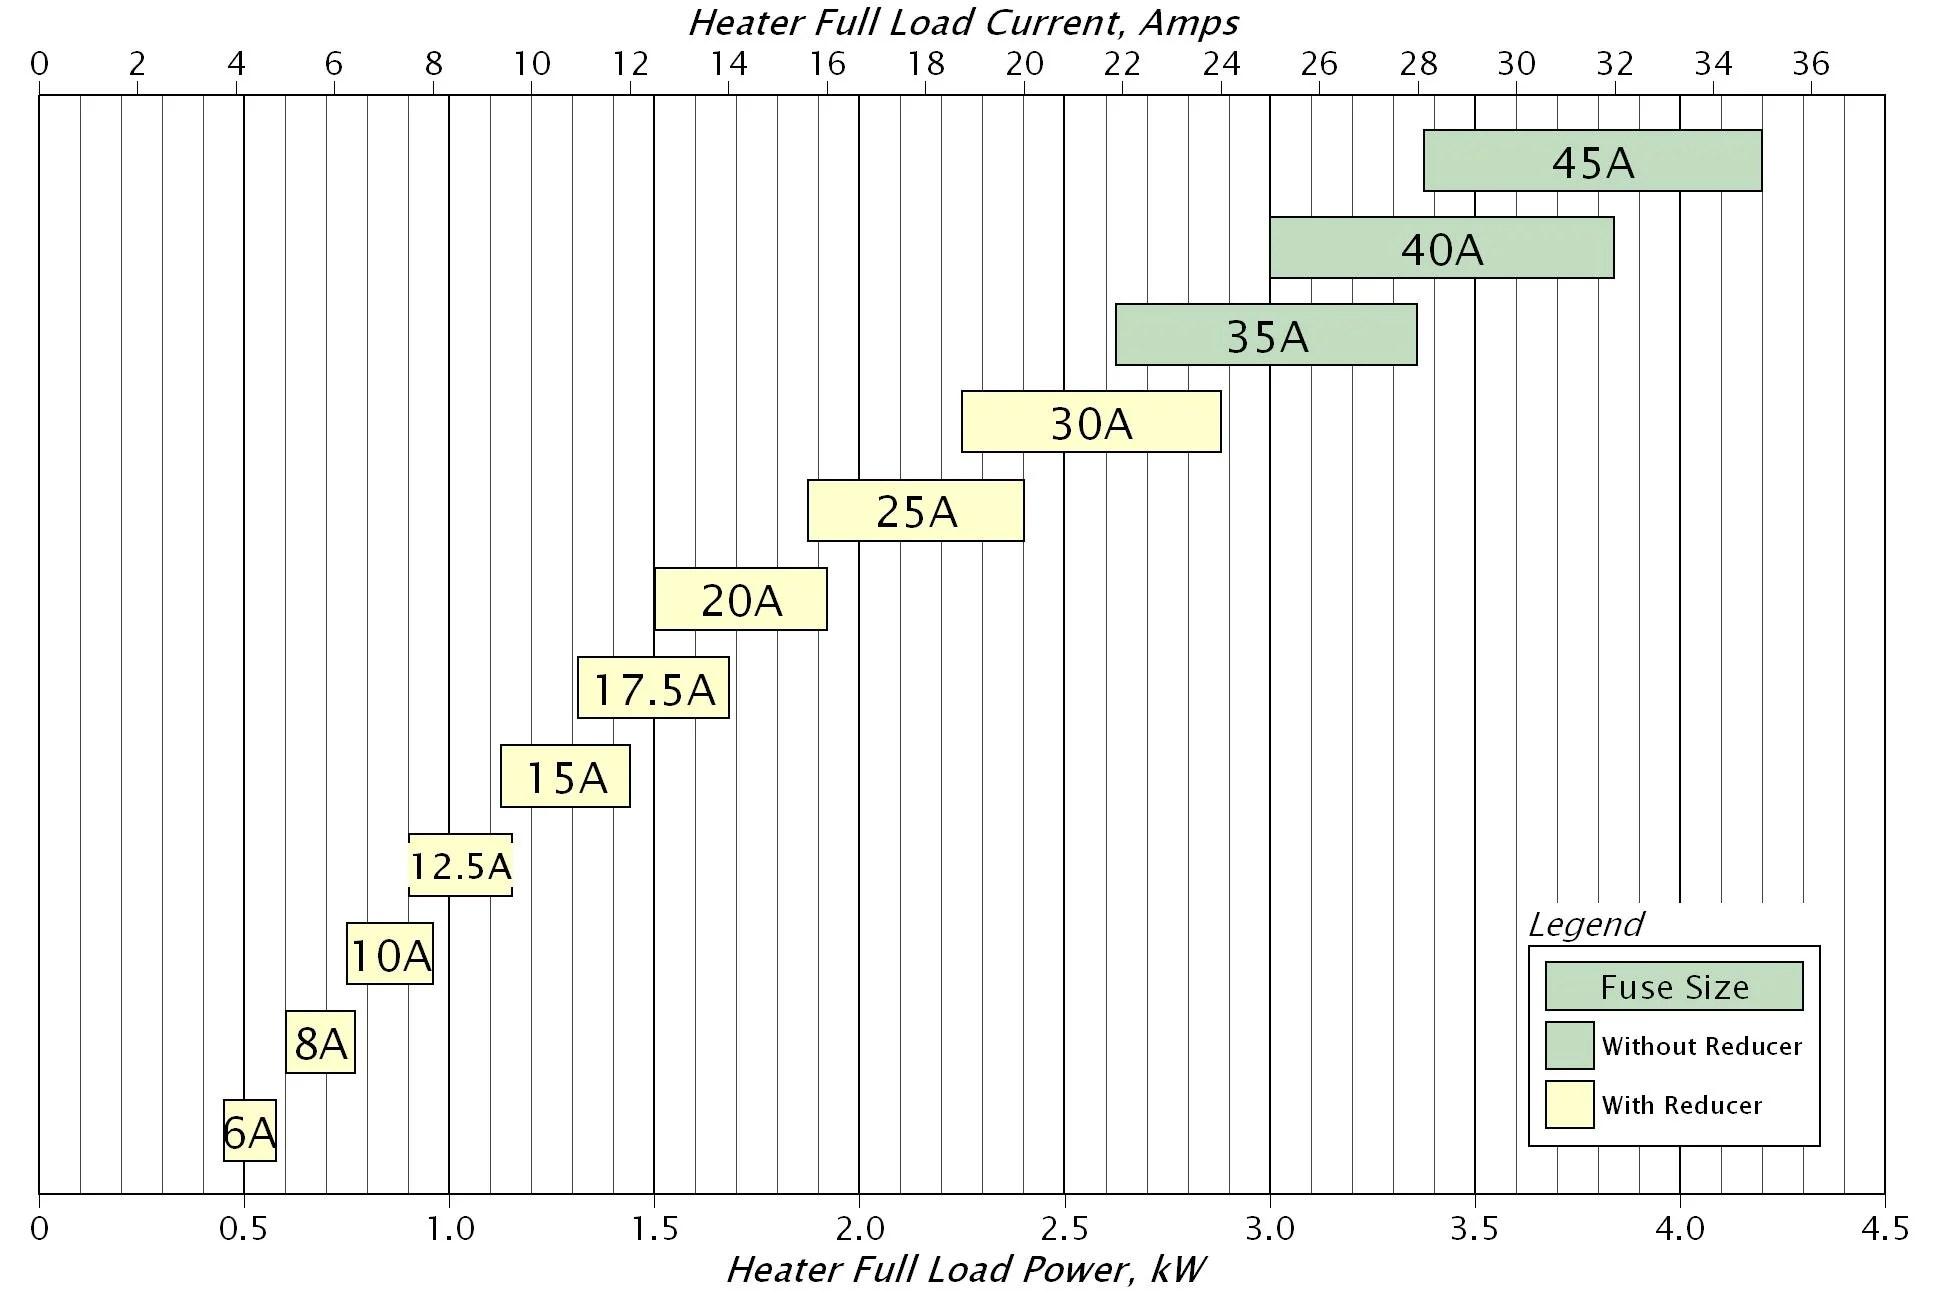 medium resolution of fuse sizing diagram ifpa 120 1p 35a